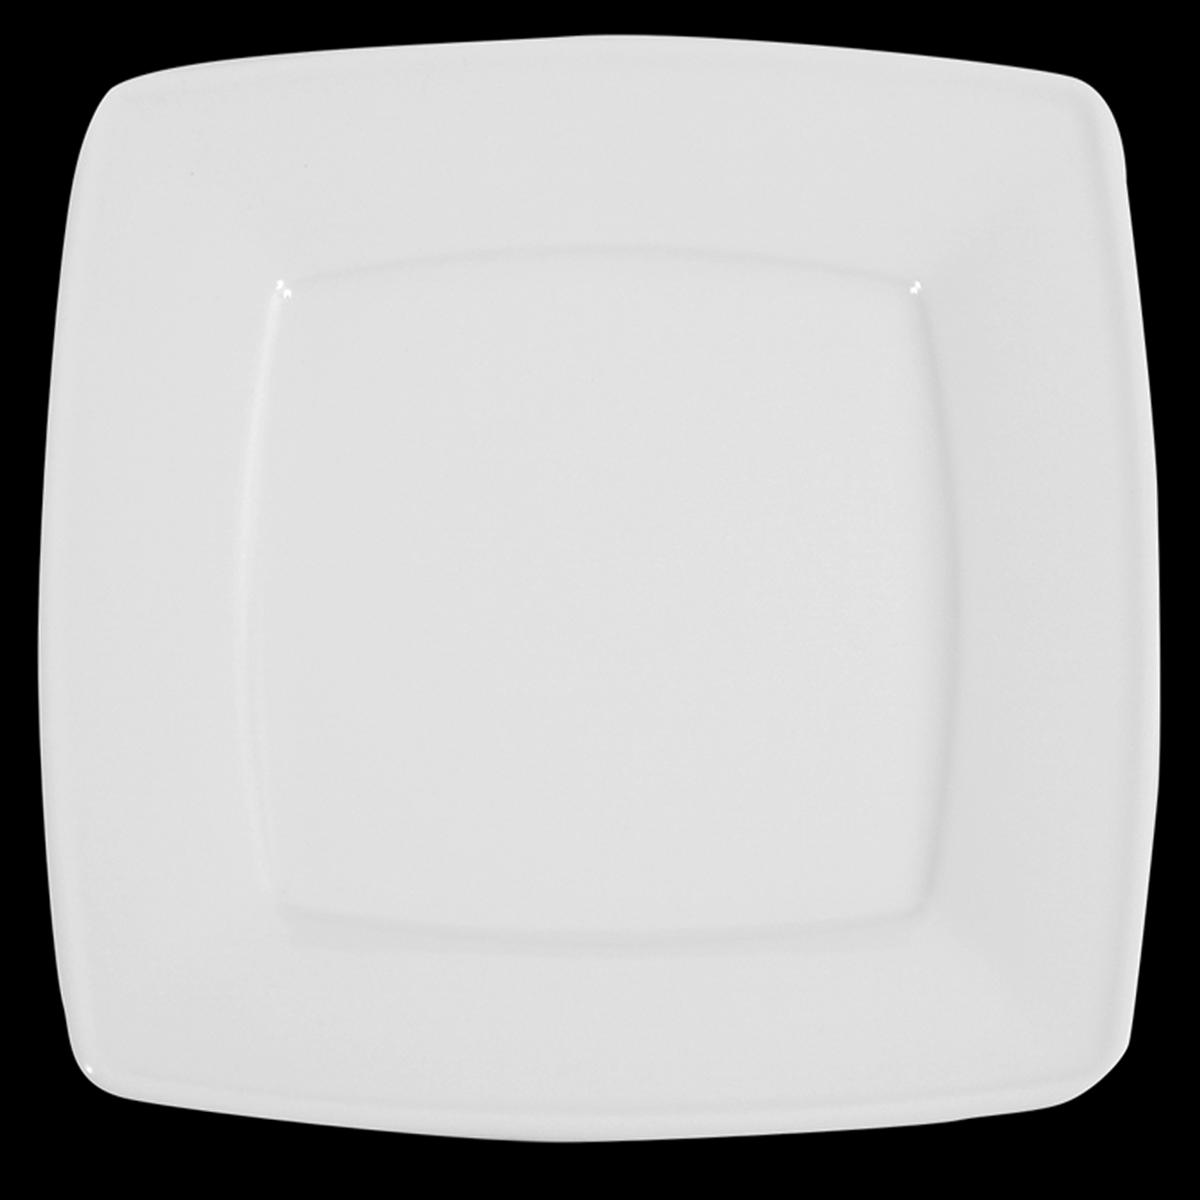 Platzteller Ambrassador, weiß, 33 cm